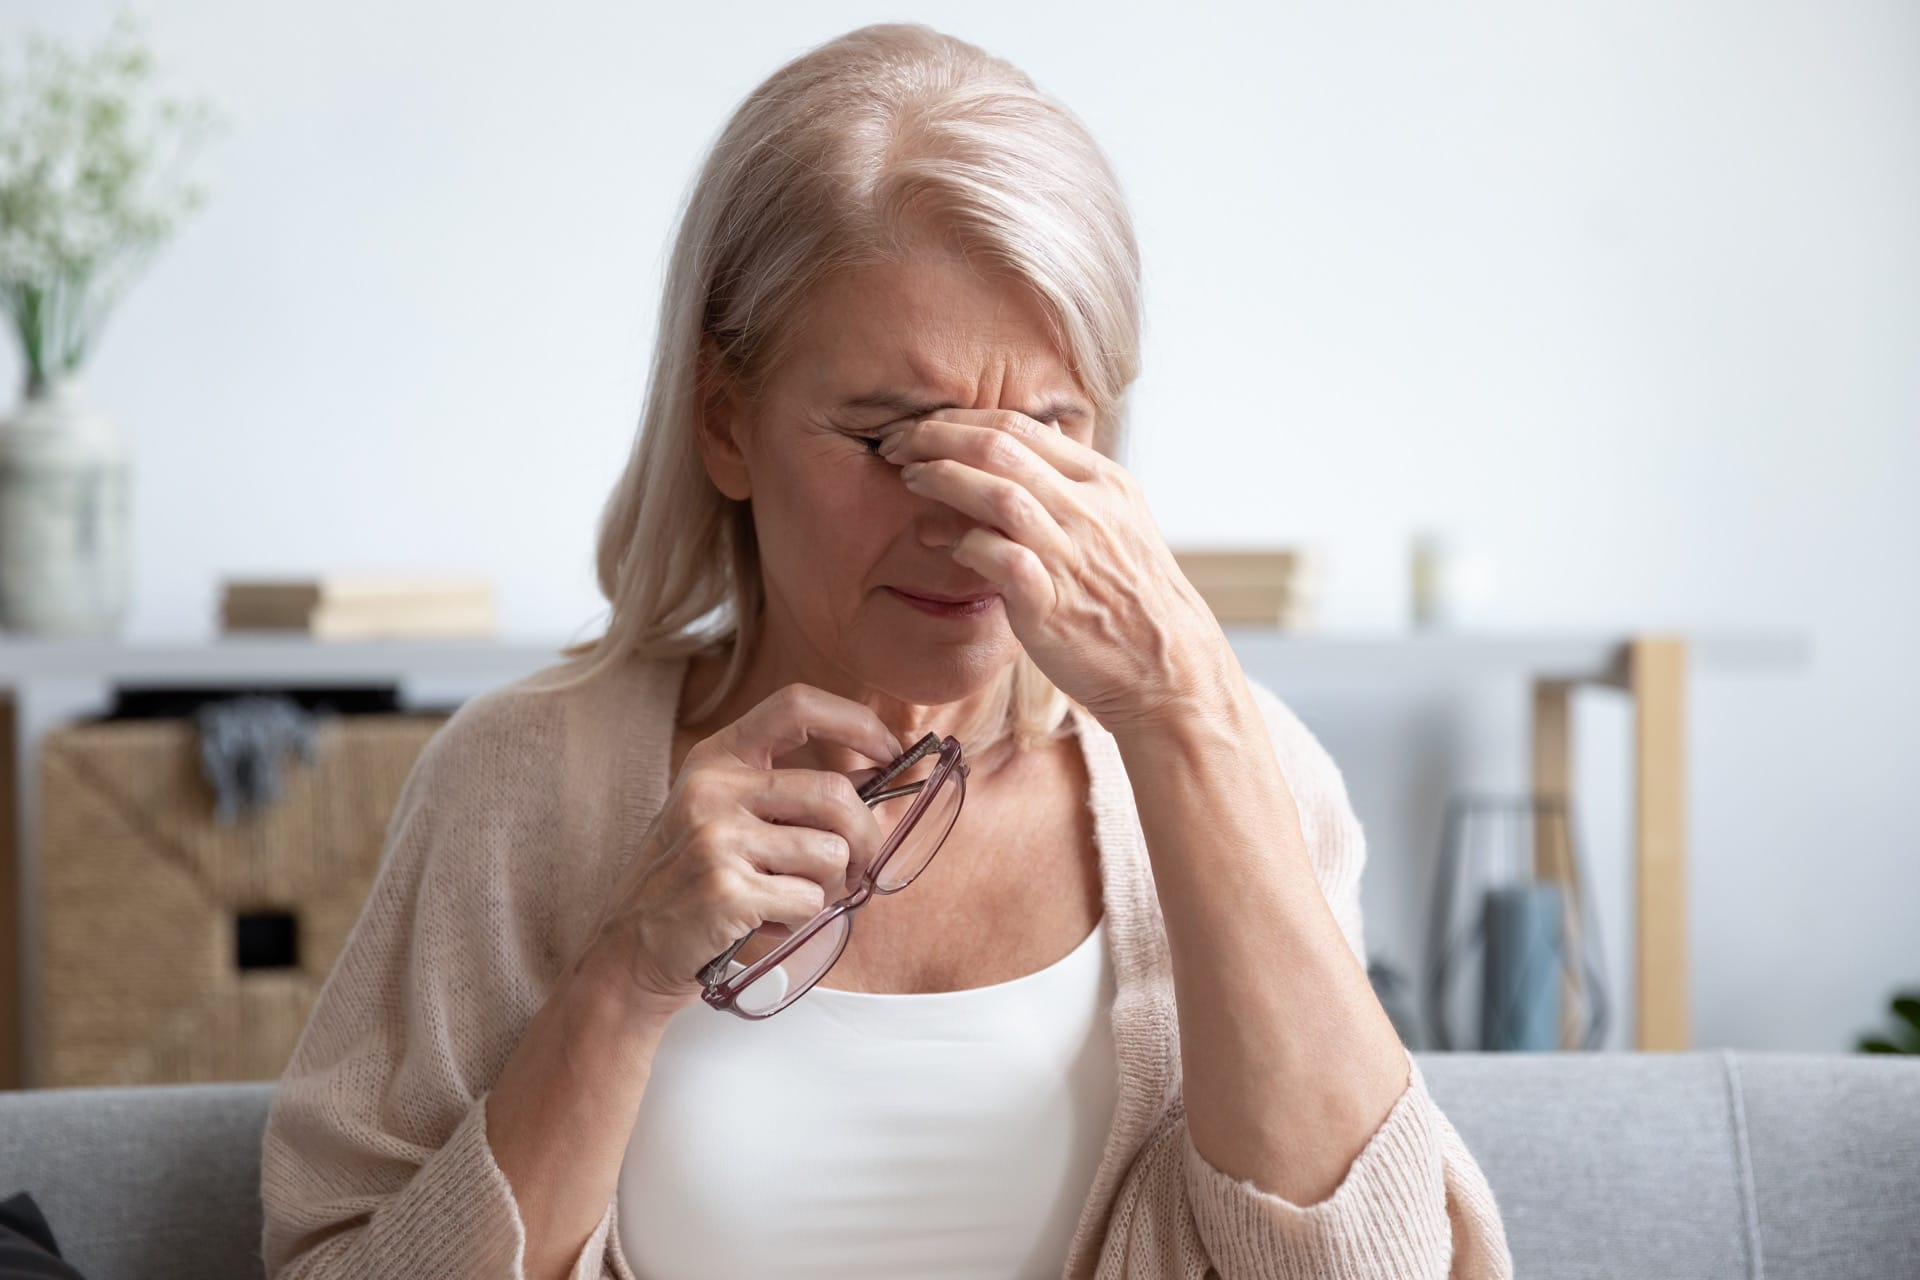 Reduce your risk of macular degeneration